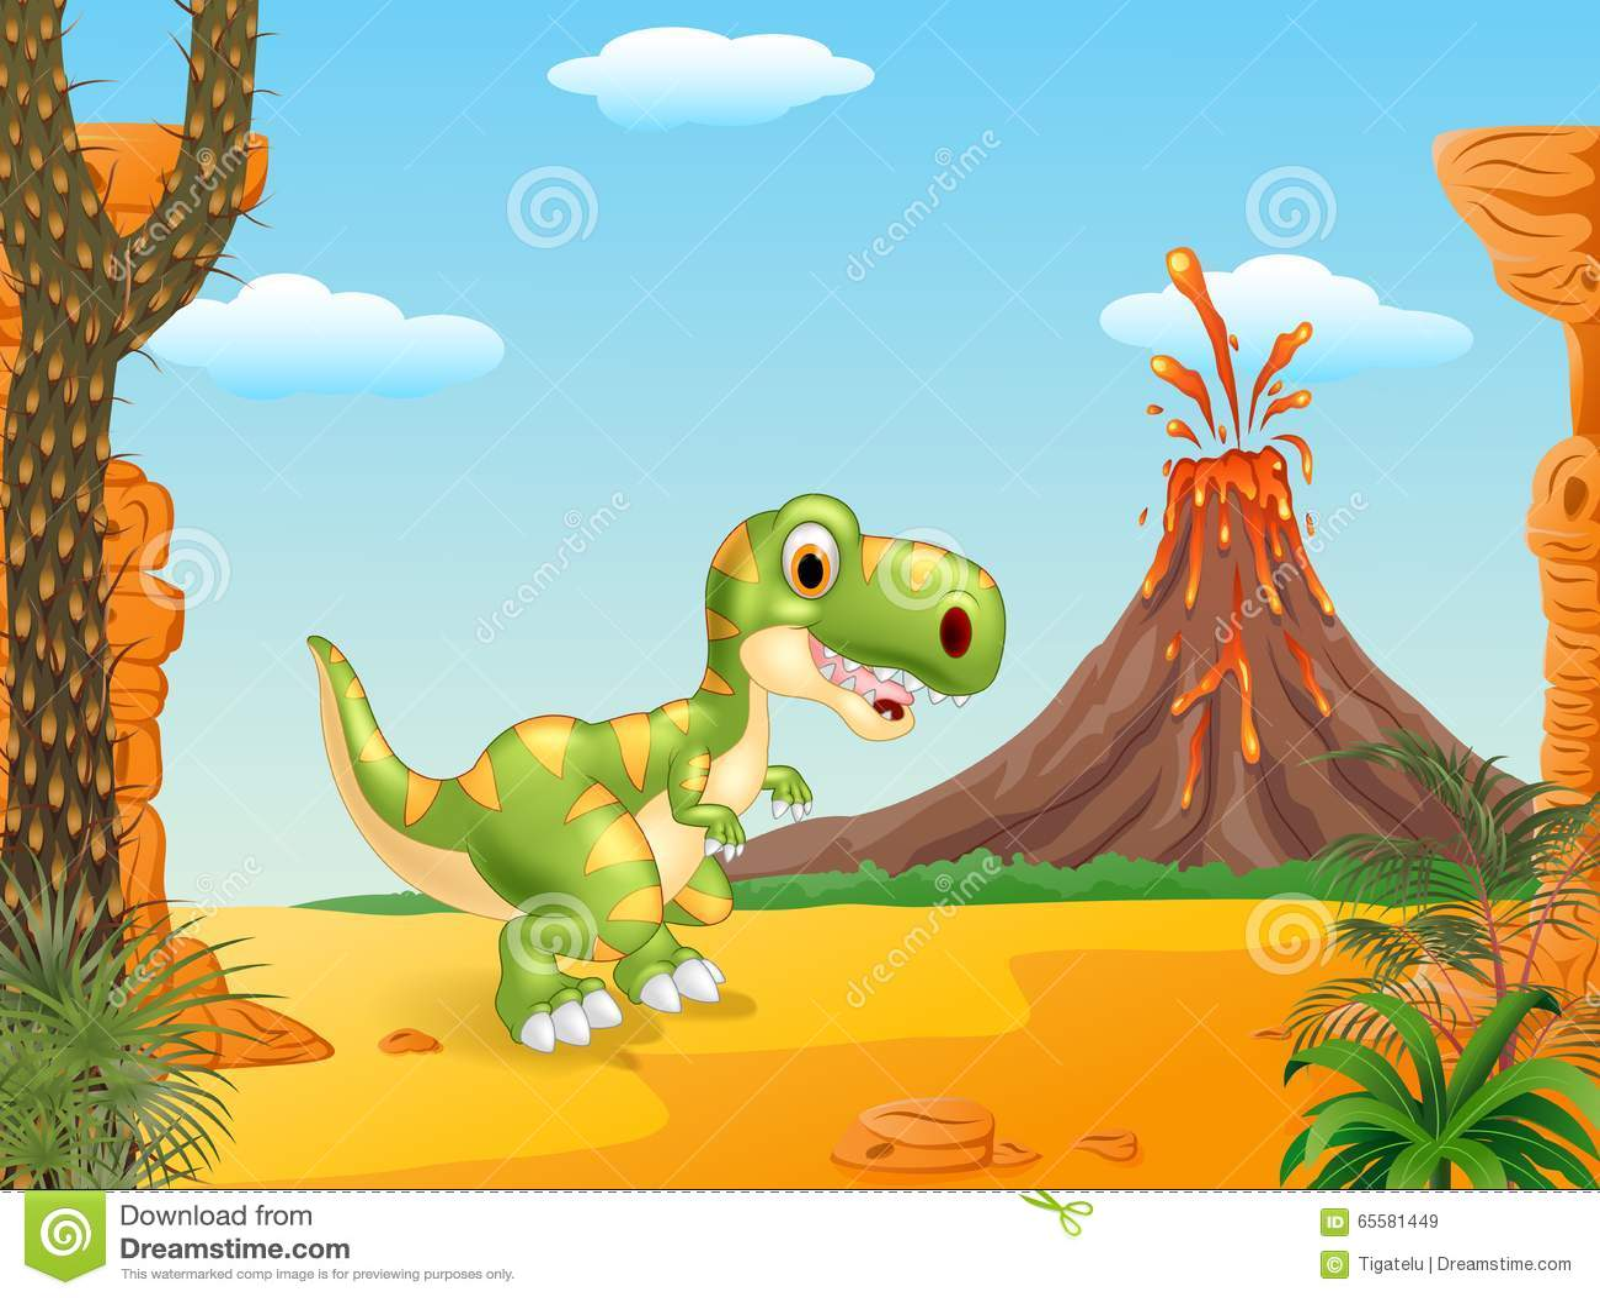 Prehistoric Scene With Happy Tyrannosaurus Dinosaur Mascot Stock Vector Illustration Of Jurassic History 65581449